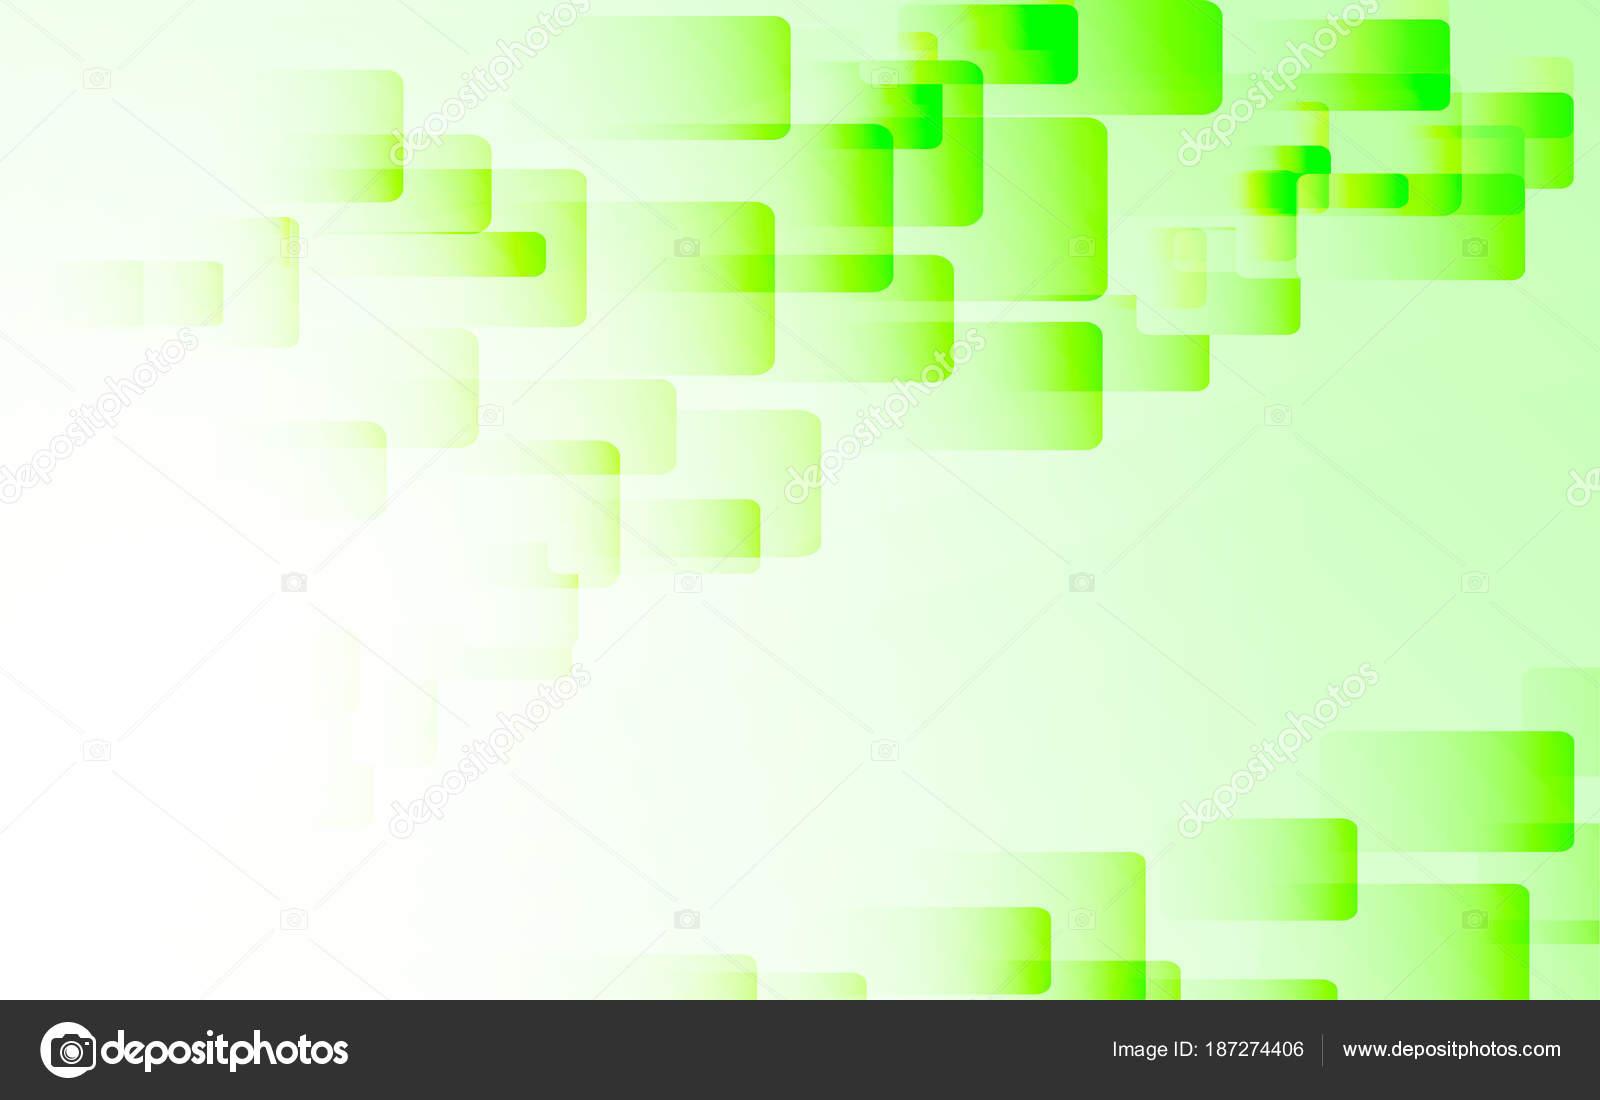 abstract cool background green square corner stock vector c ifee 187274406 https depositphotos com 187274406 stock illustration abstract cool background green square html